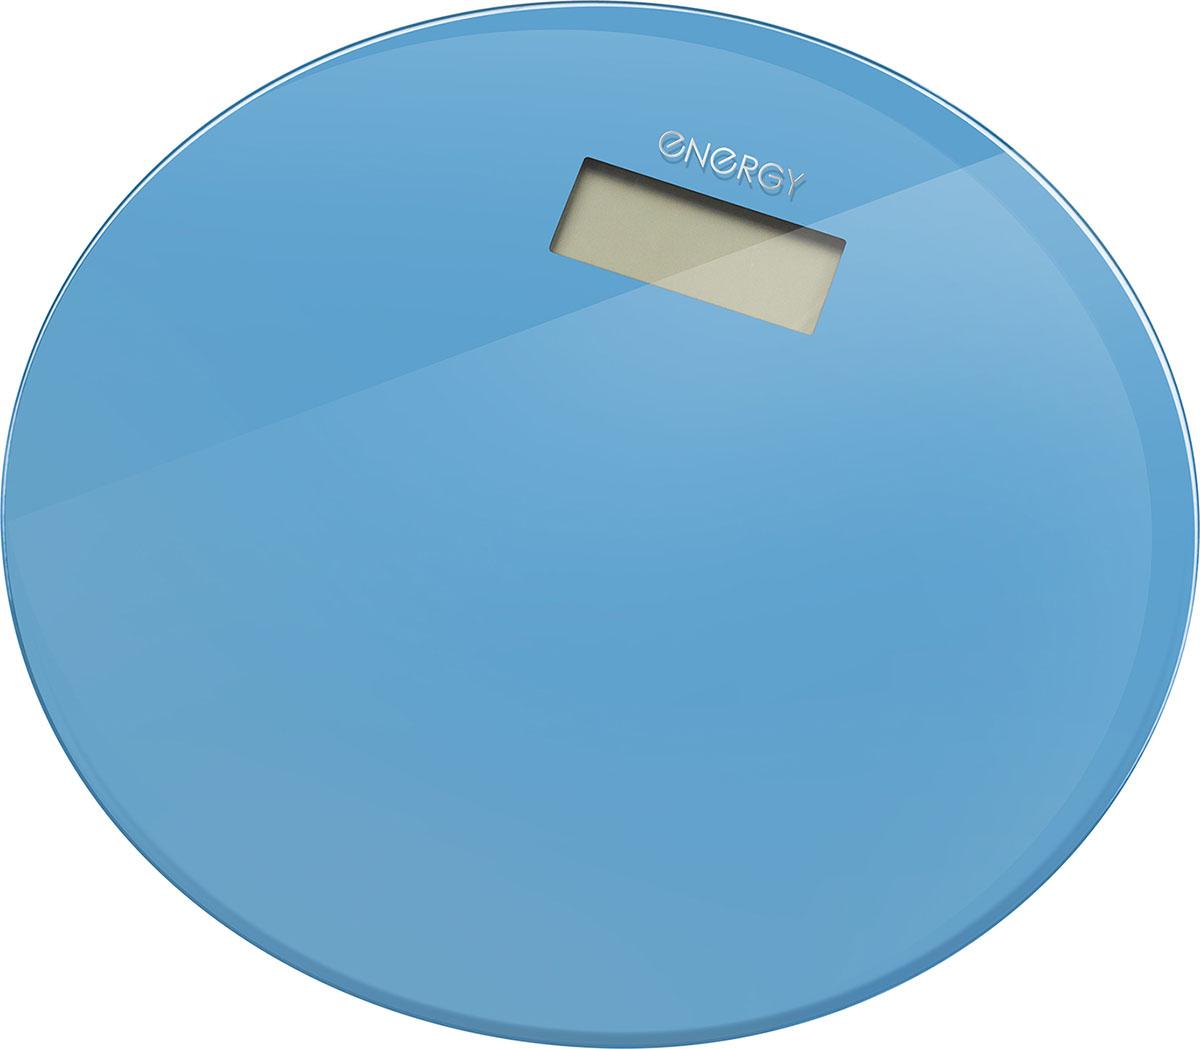 Energy EN-420 RIO, Blue напольные весы energy весы напольные электронные en 419d energy